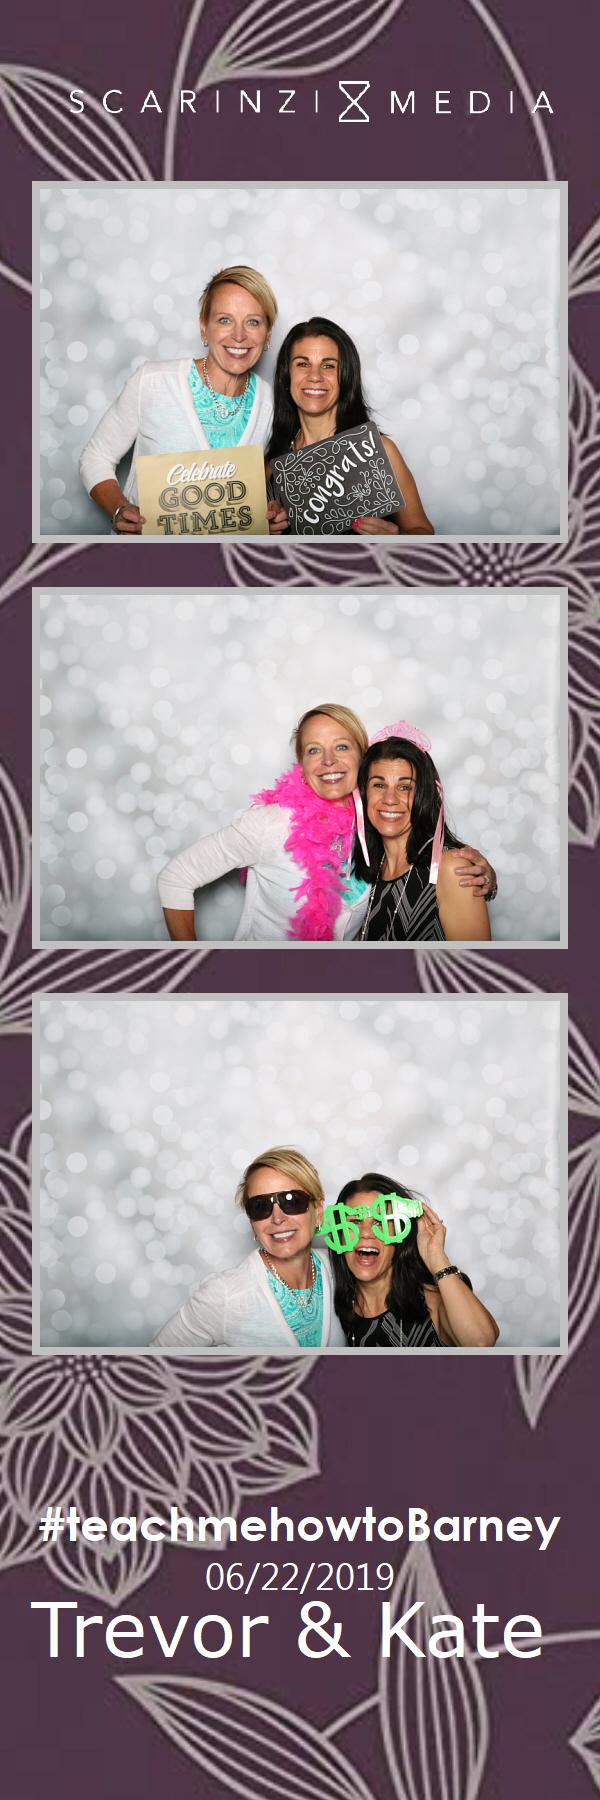 2019.06.22 - Barney Wedding PHOTOBOOTH06.jpg